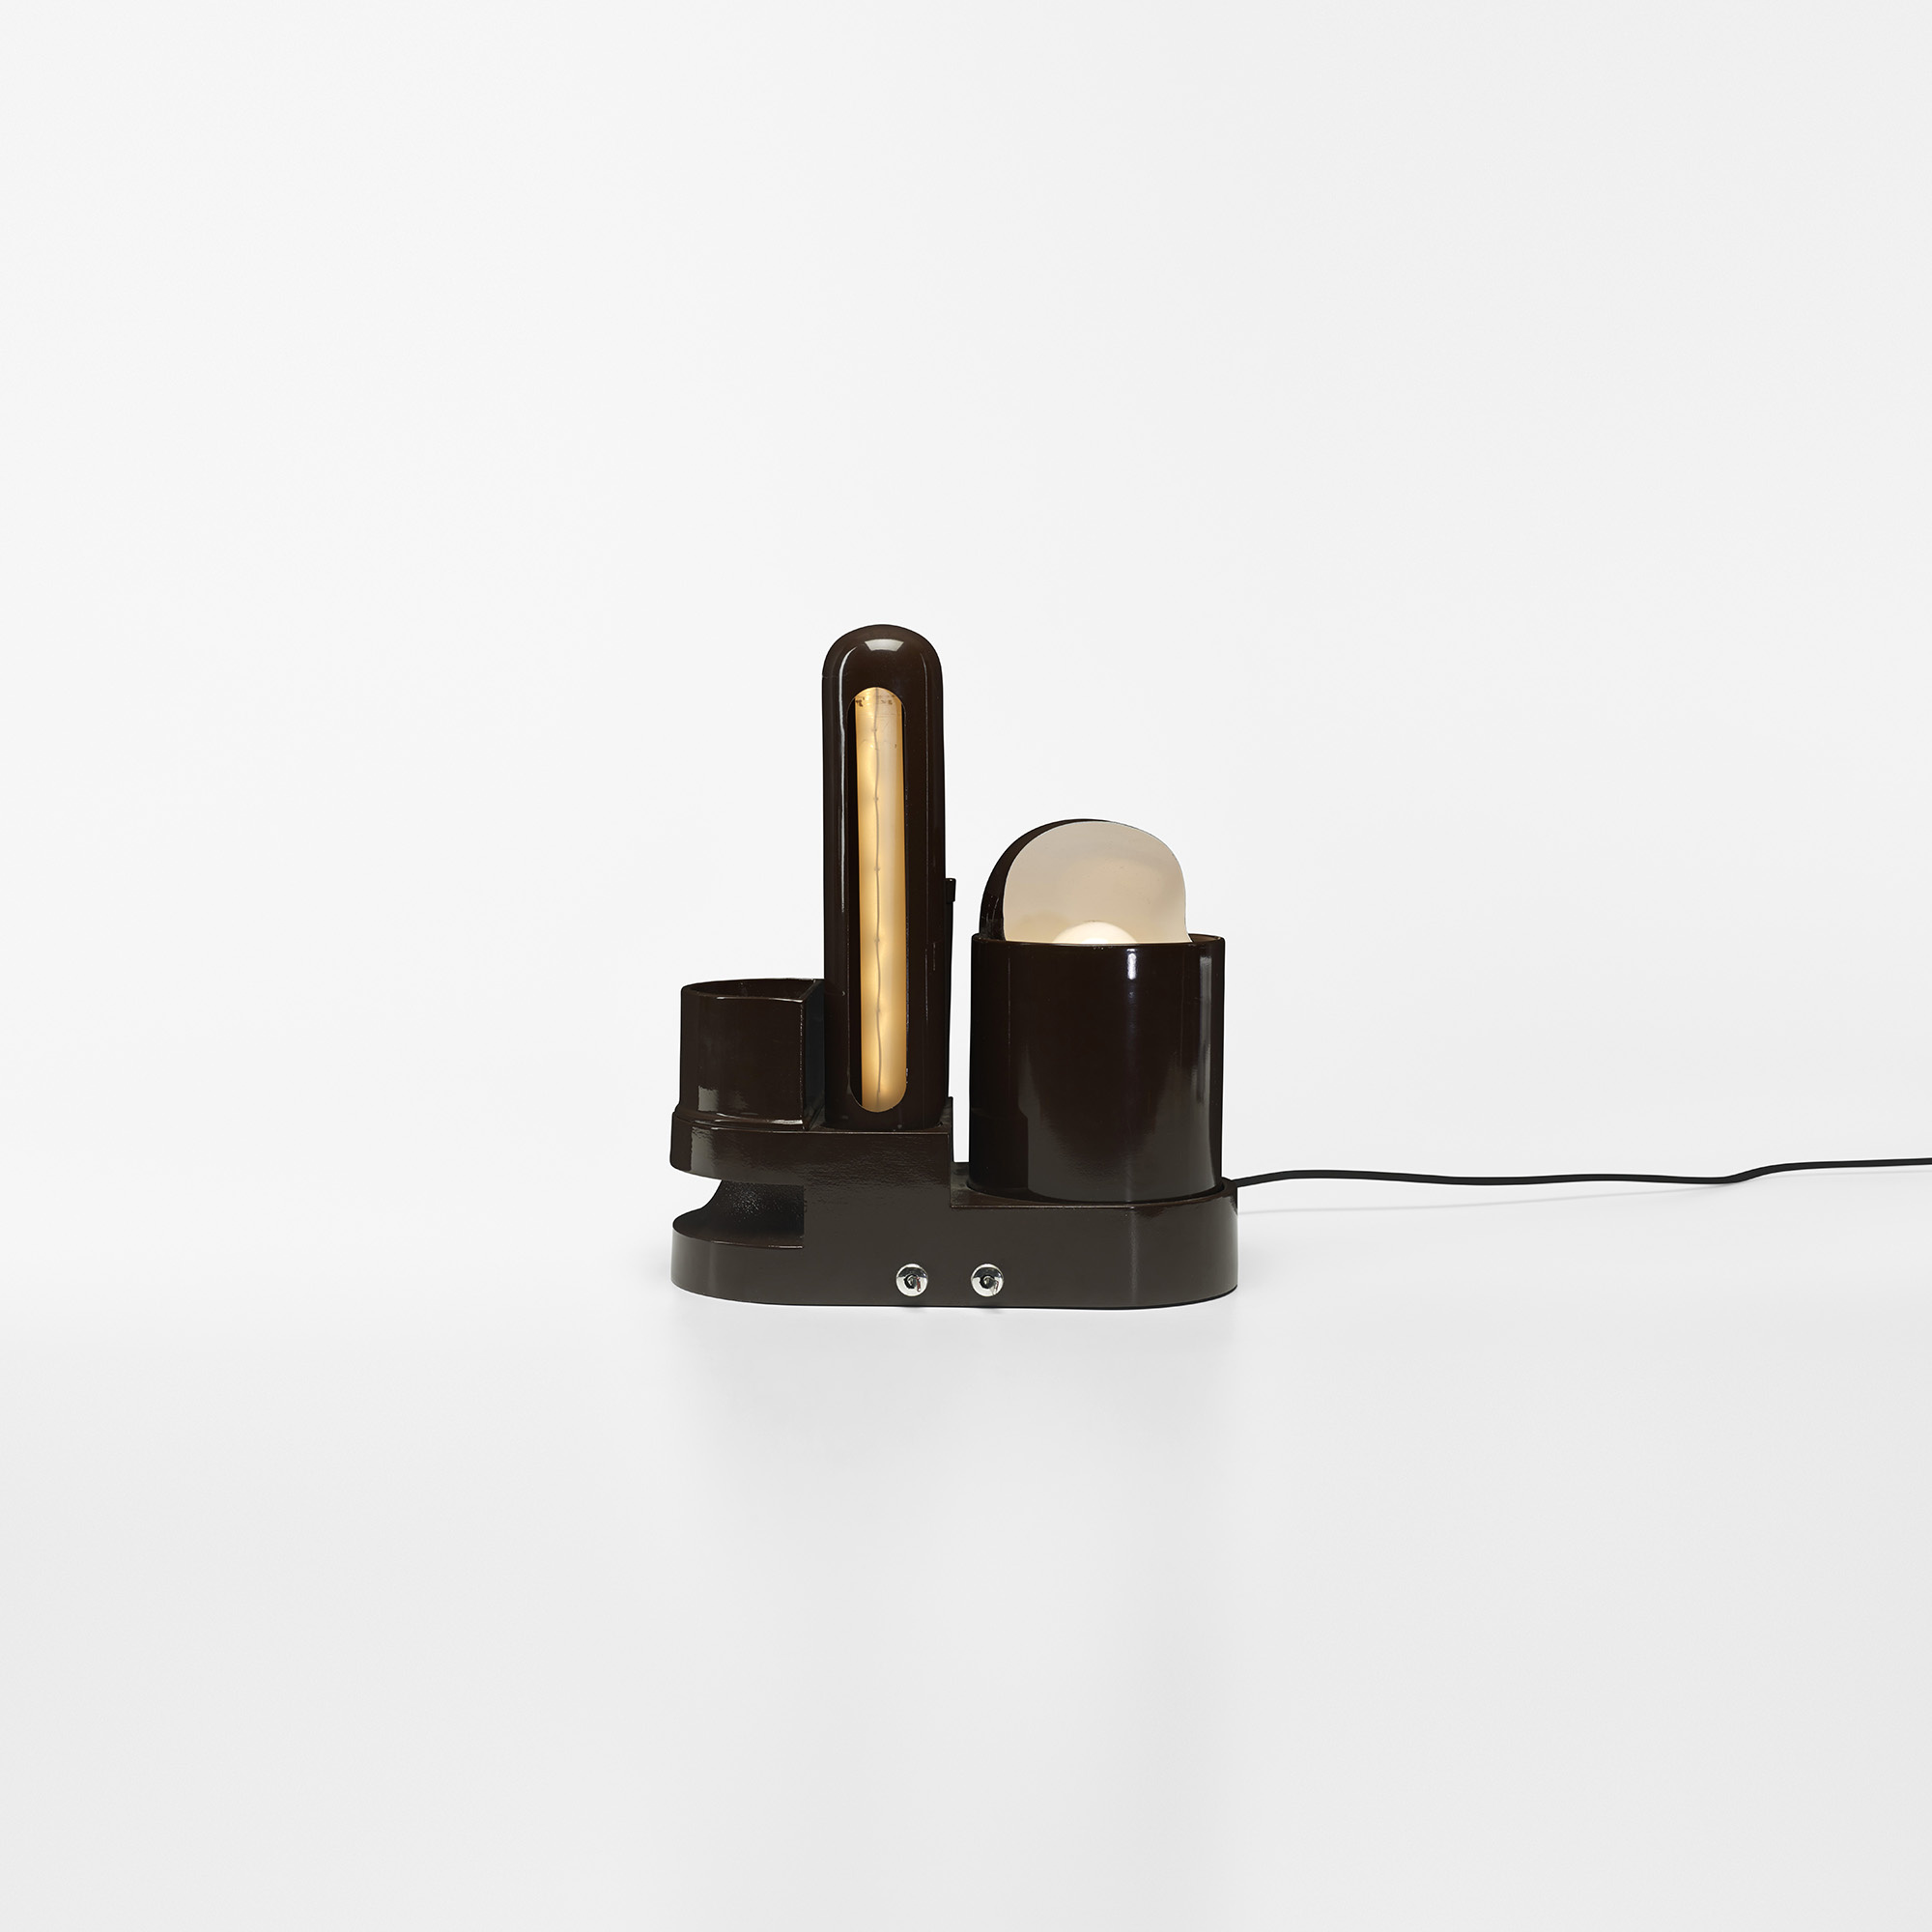 374 Gae Aulenti Rimorchiatore table lamp Modern Design 28